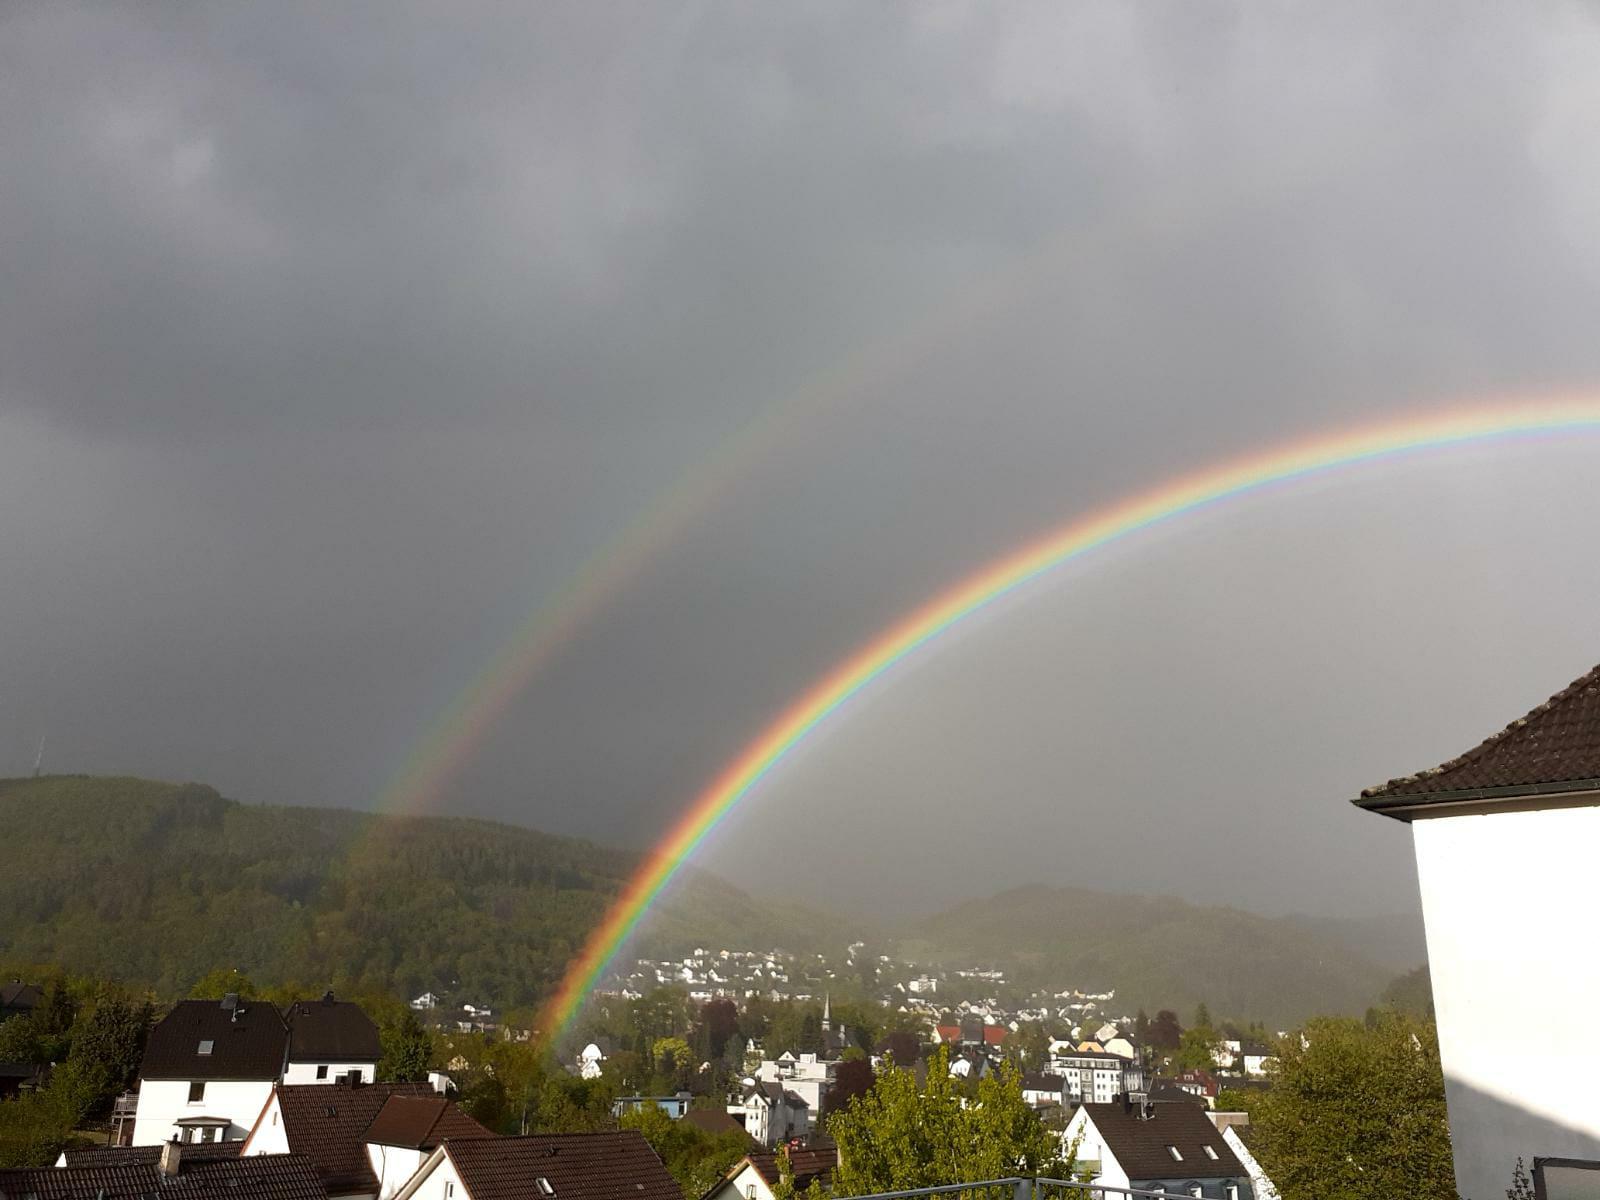 Plettenberg unterm Regenbogen